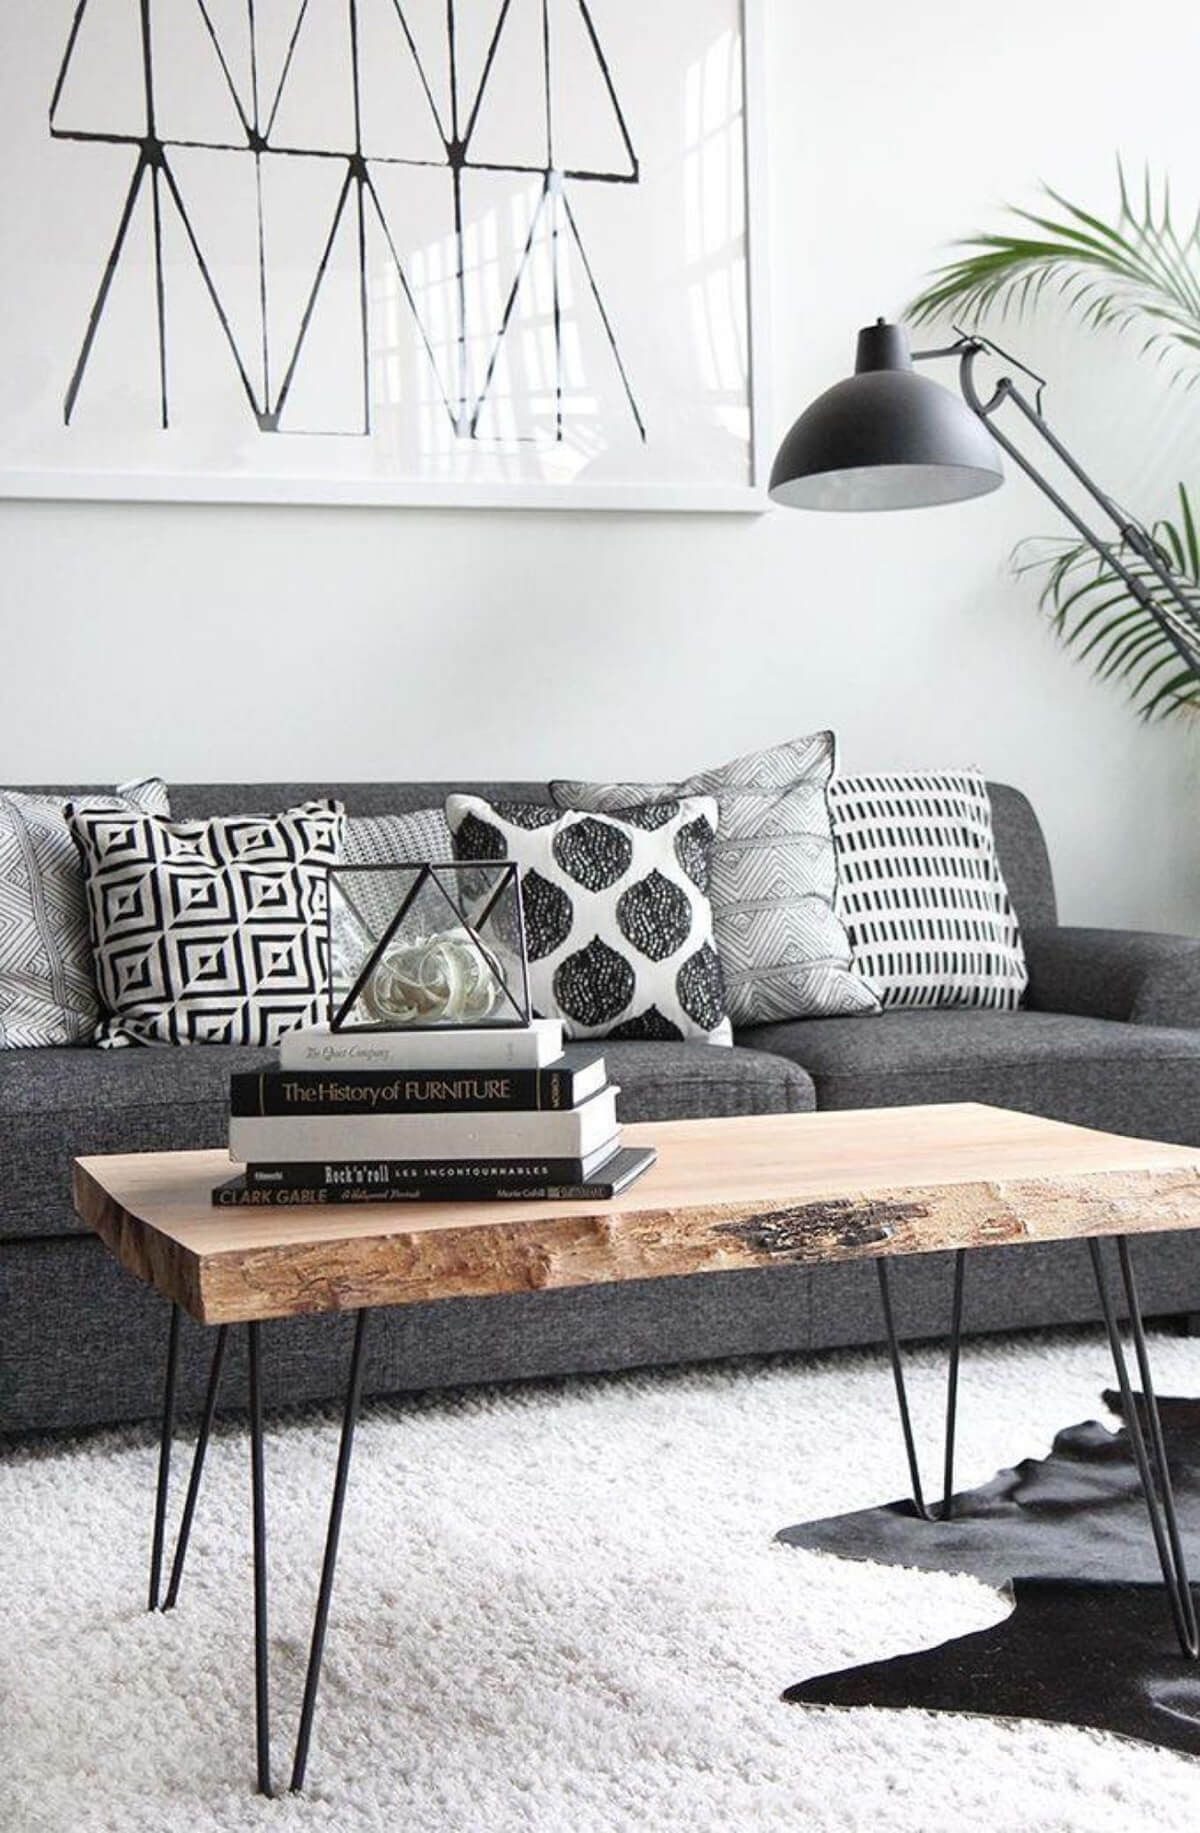 Scandinavian Design Ideas for You Home Décor | Wood slab, Display ...